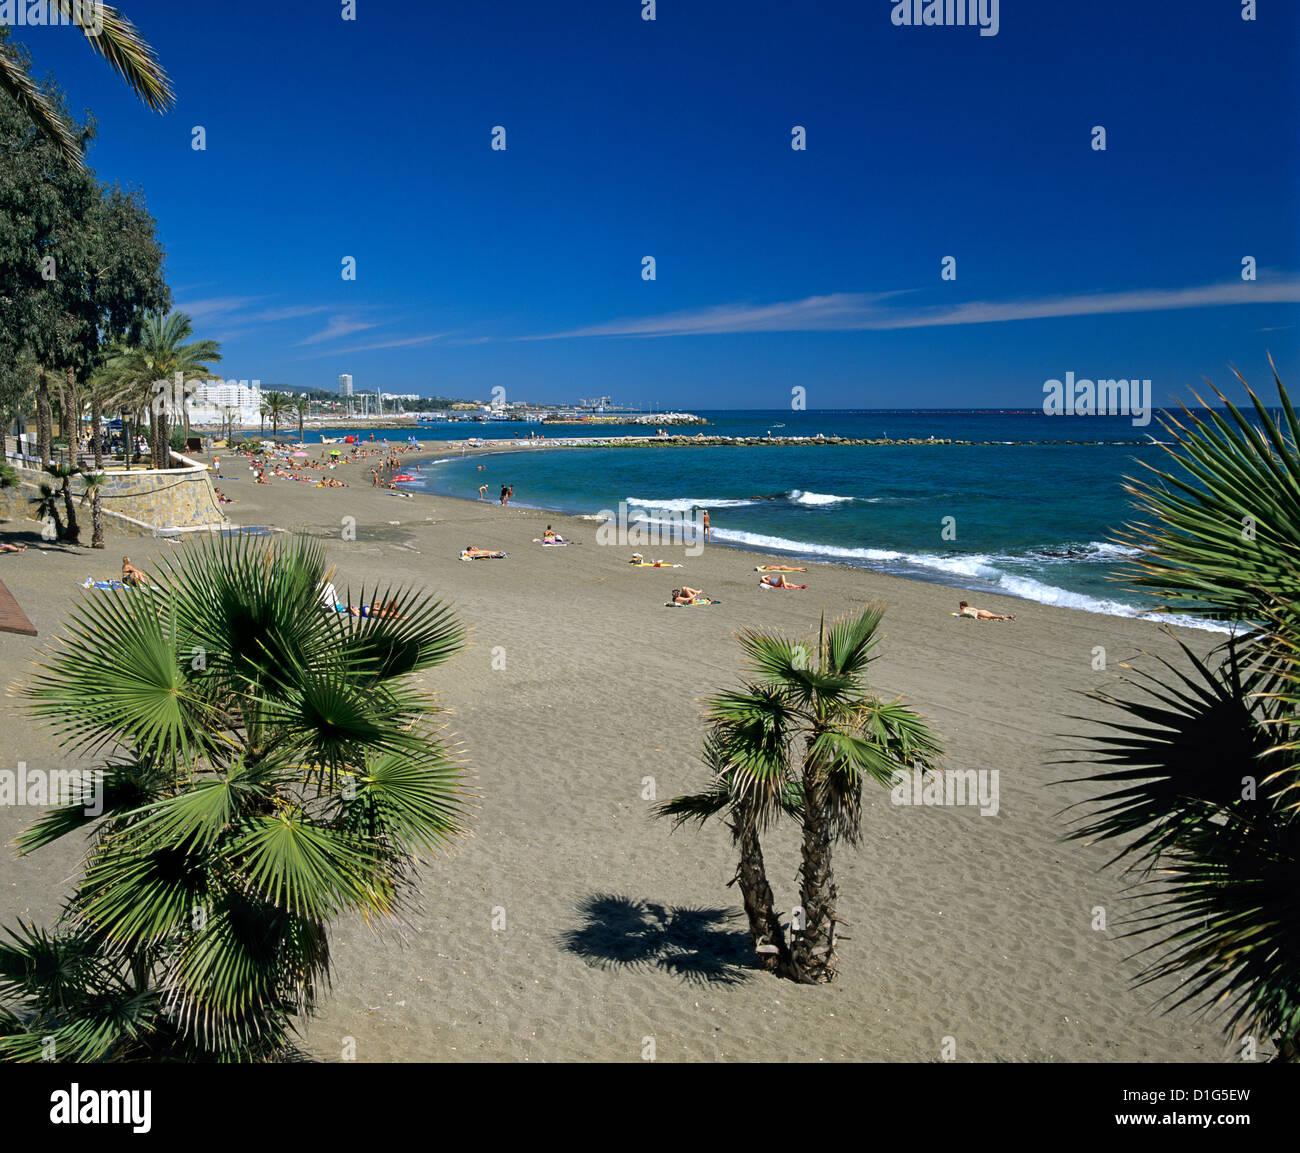 Blick entlang der Beach, Marbella, Costa del Sol, Andalusien, Spanien, Mittelmeer, Europa Stockbild